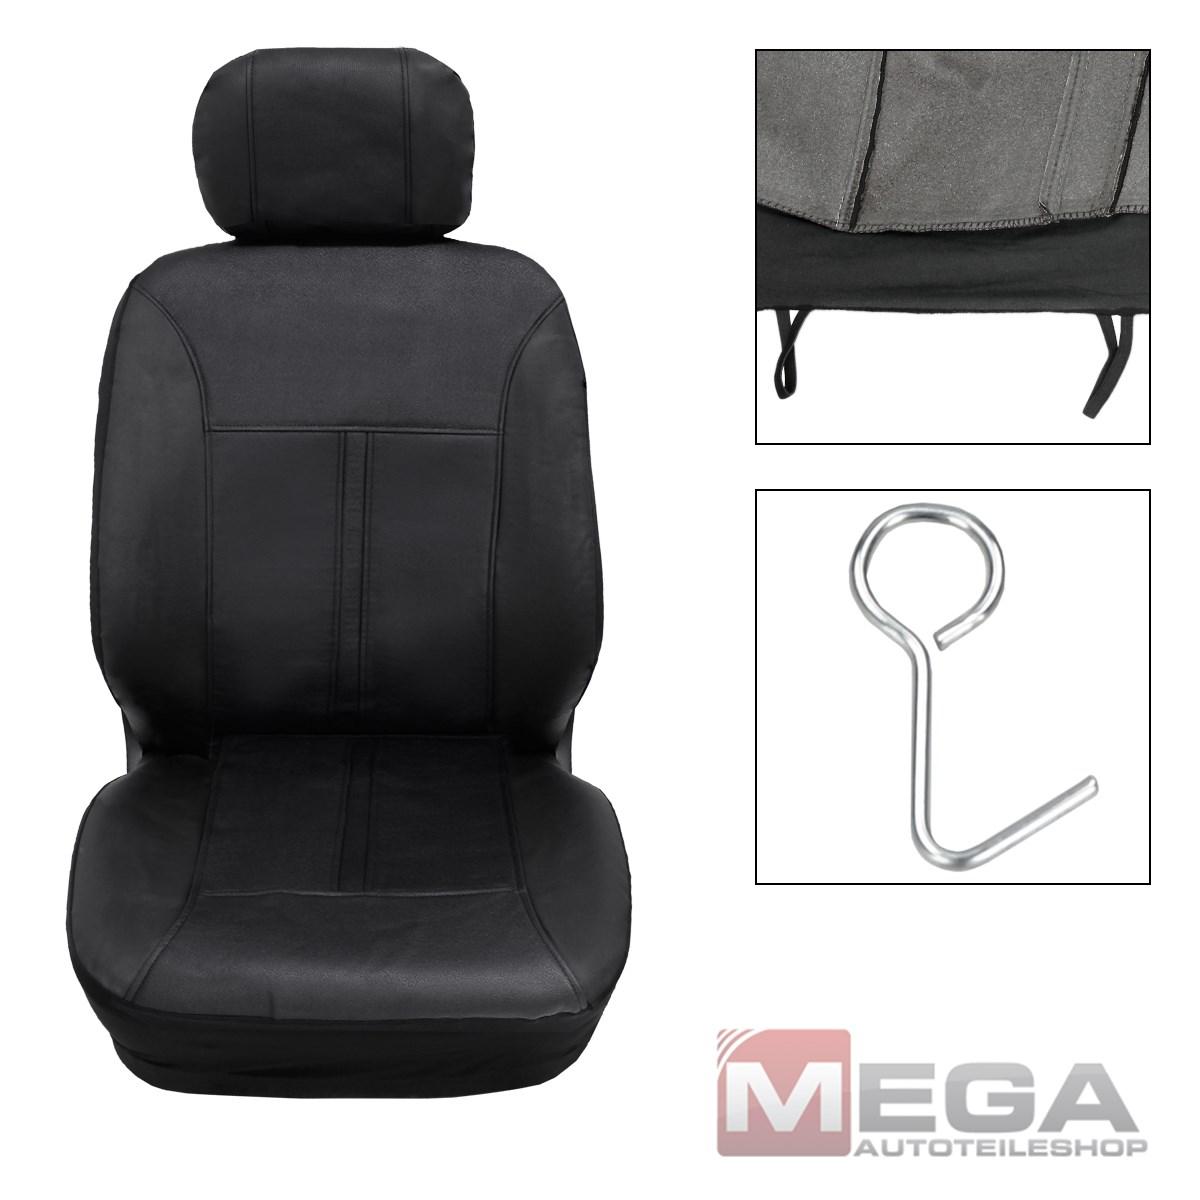 universal auto sitzbezug kunstleder sitzbez ge schonbezug komplettset schwarz ebay. Black Bedroom Furniture Sets. Home Design Ideas